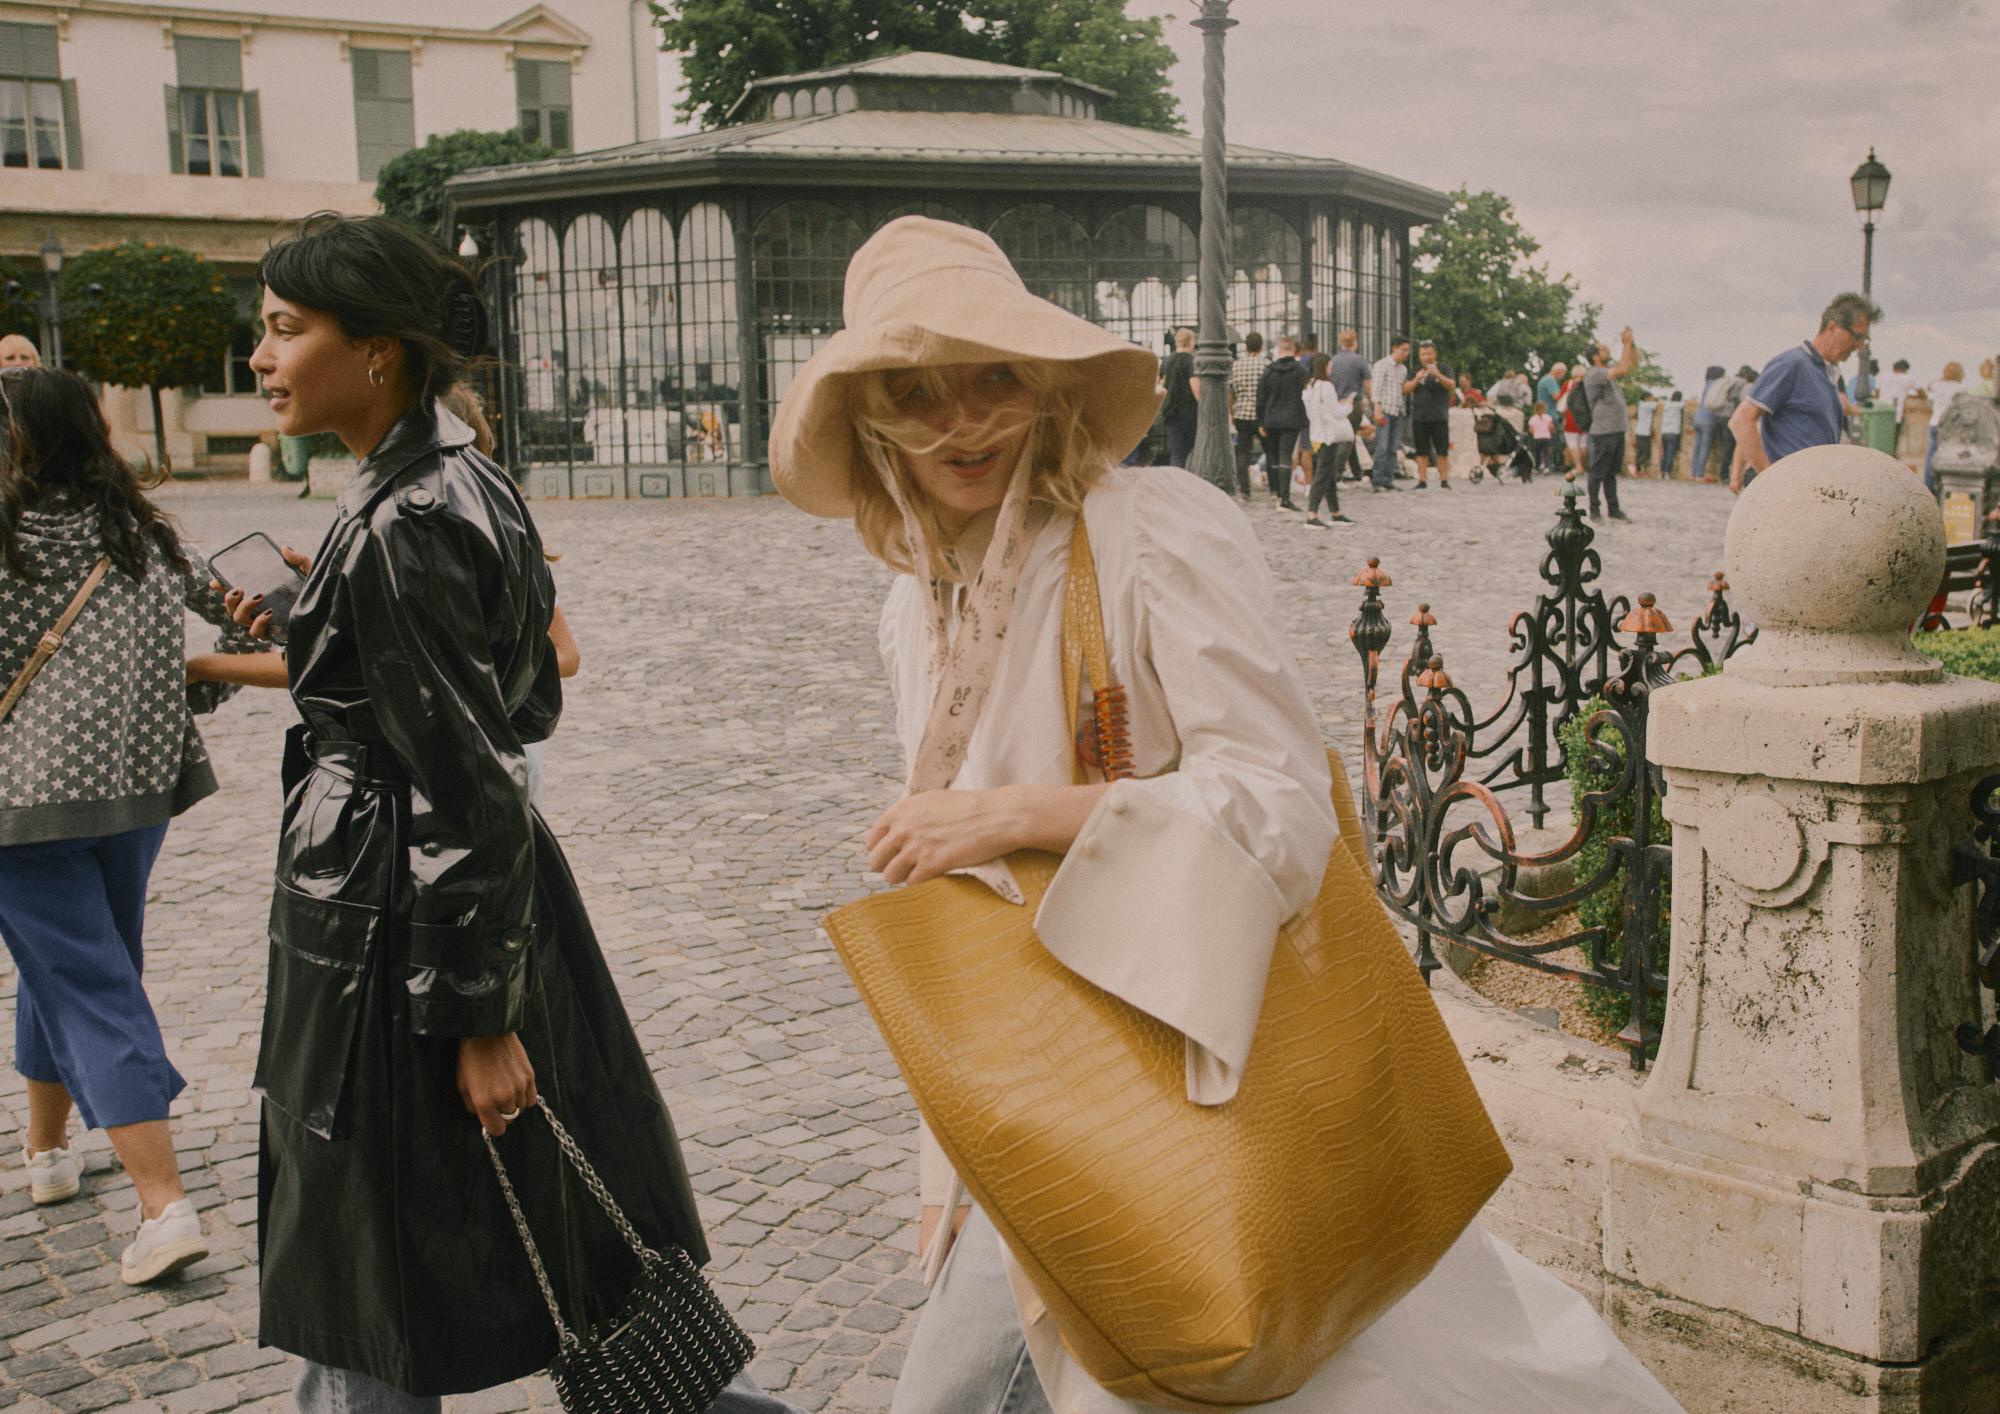 Ambar Vinyl Trench Coat | €870   Yoon Shirt Dress | €580   Sahara Oversized Tote Bag | €470